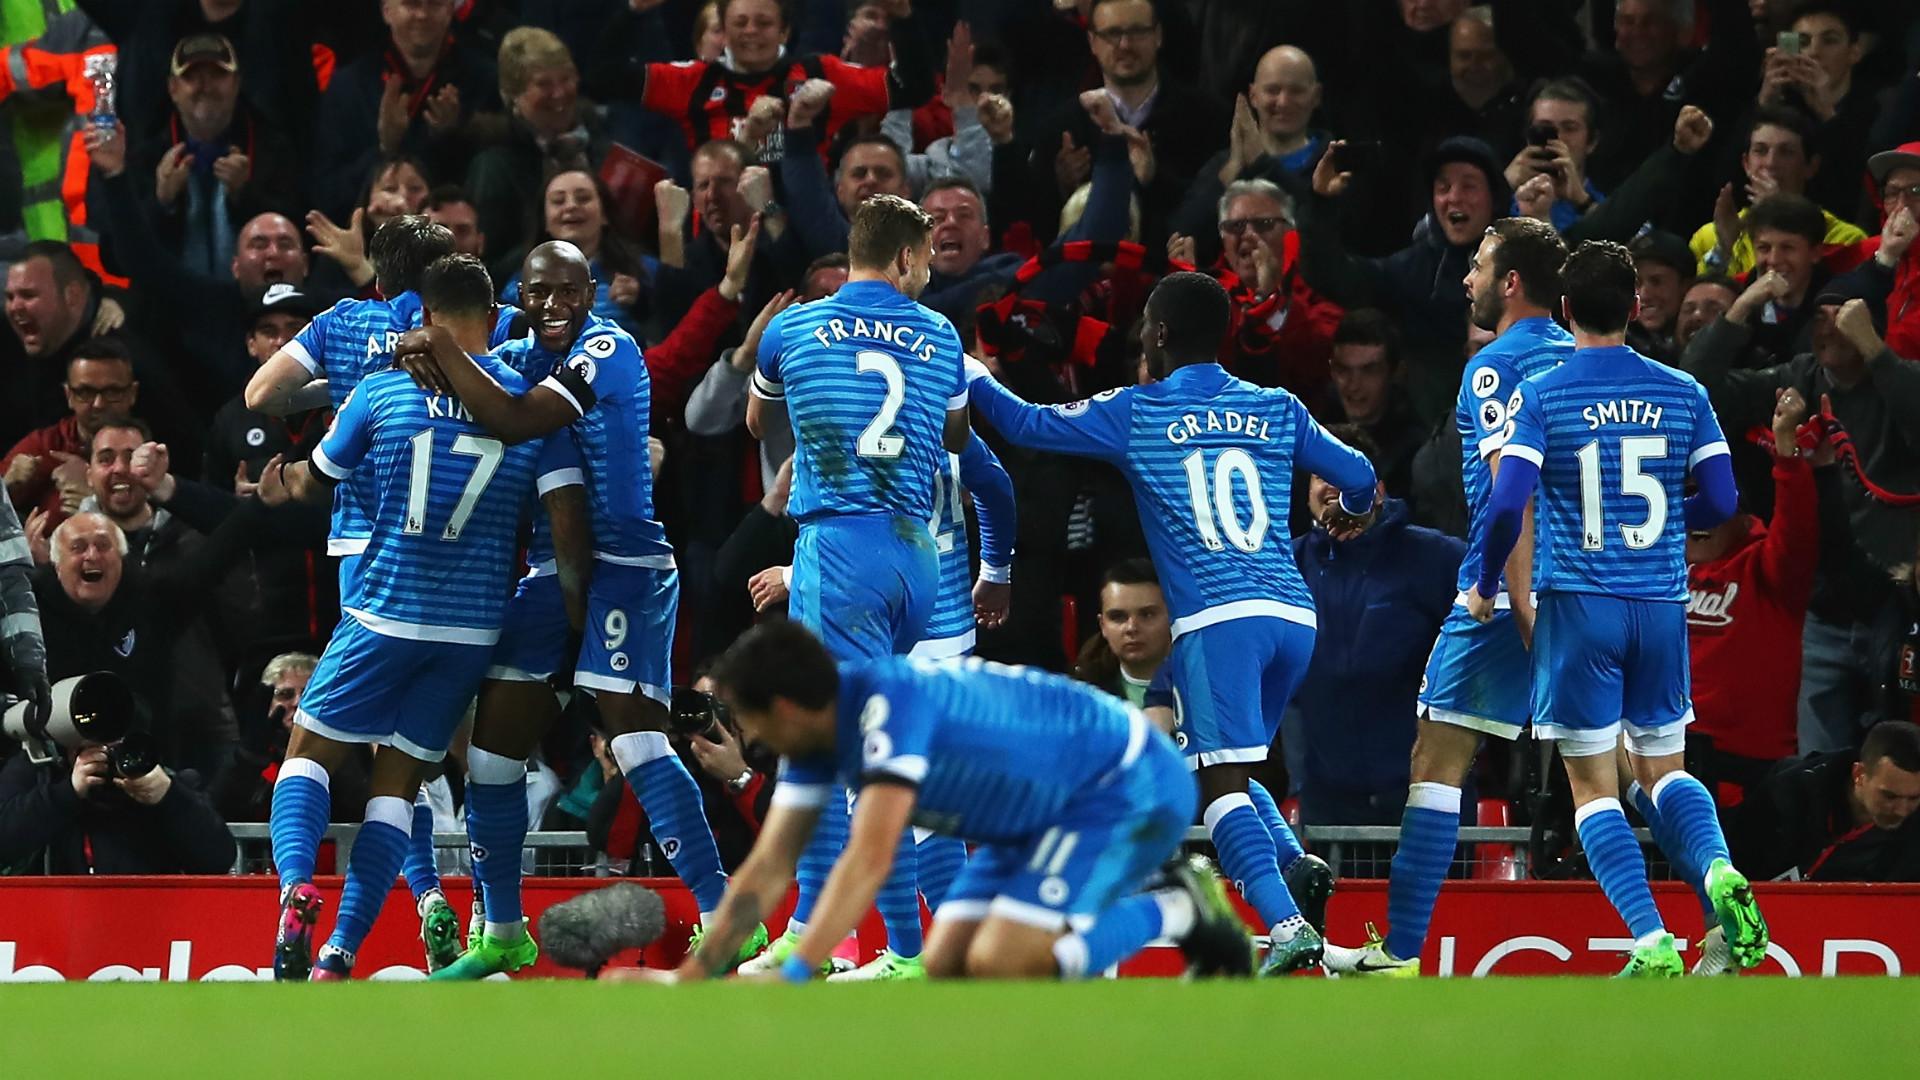 Coutinho, Firmino inspire Liverpool comeback over Stoke